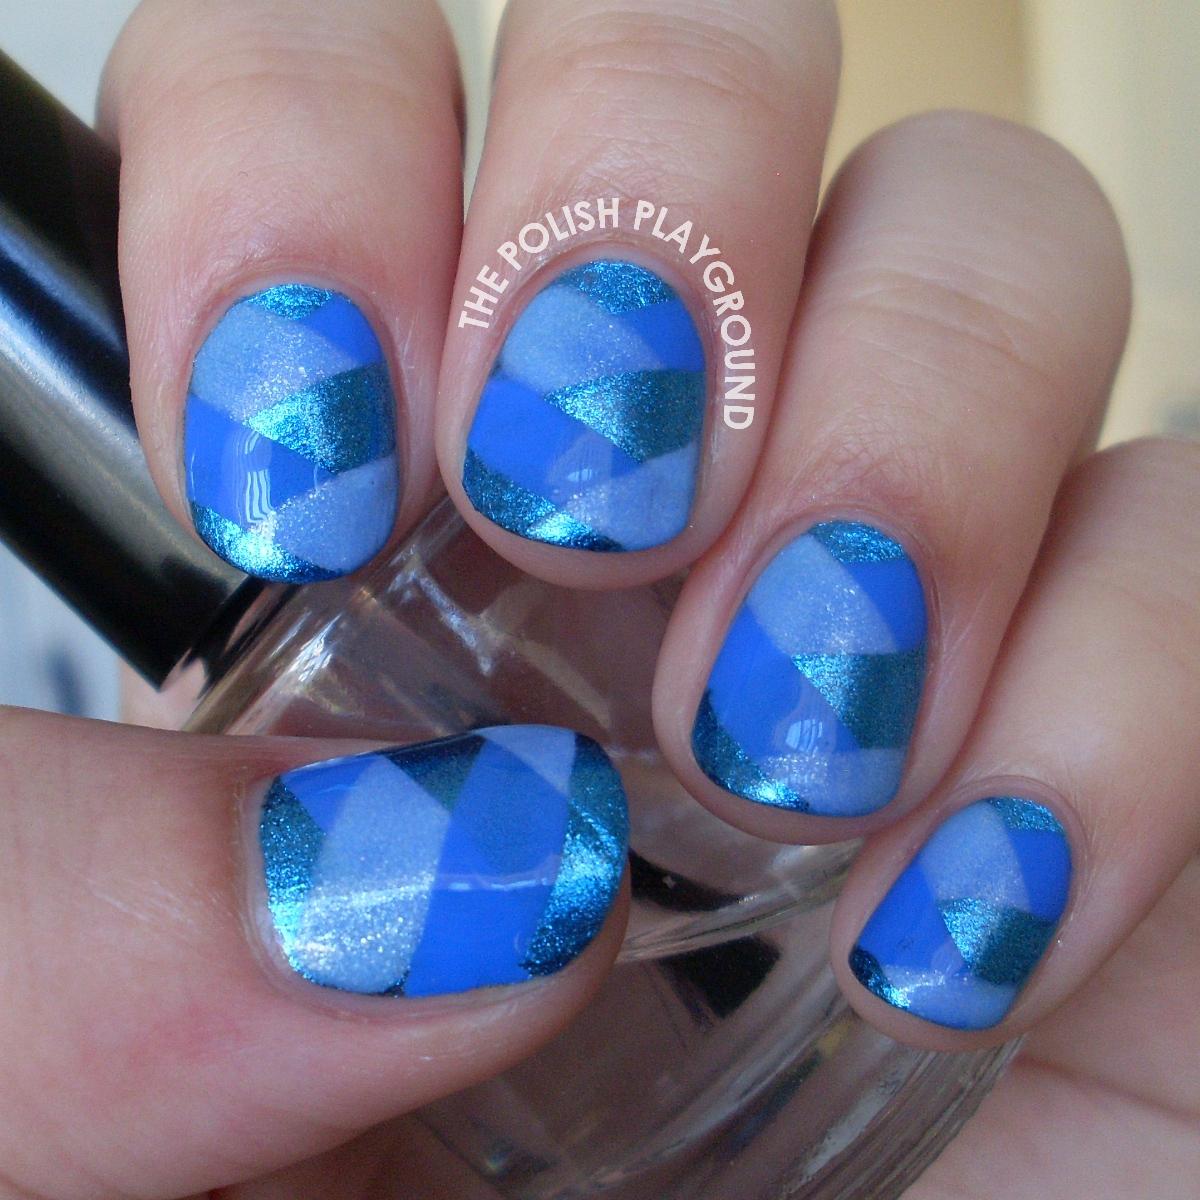 Blue Nail Art: The Polish Playground: Blue Fishtail Braided Nail Art